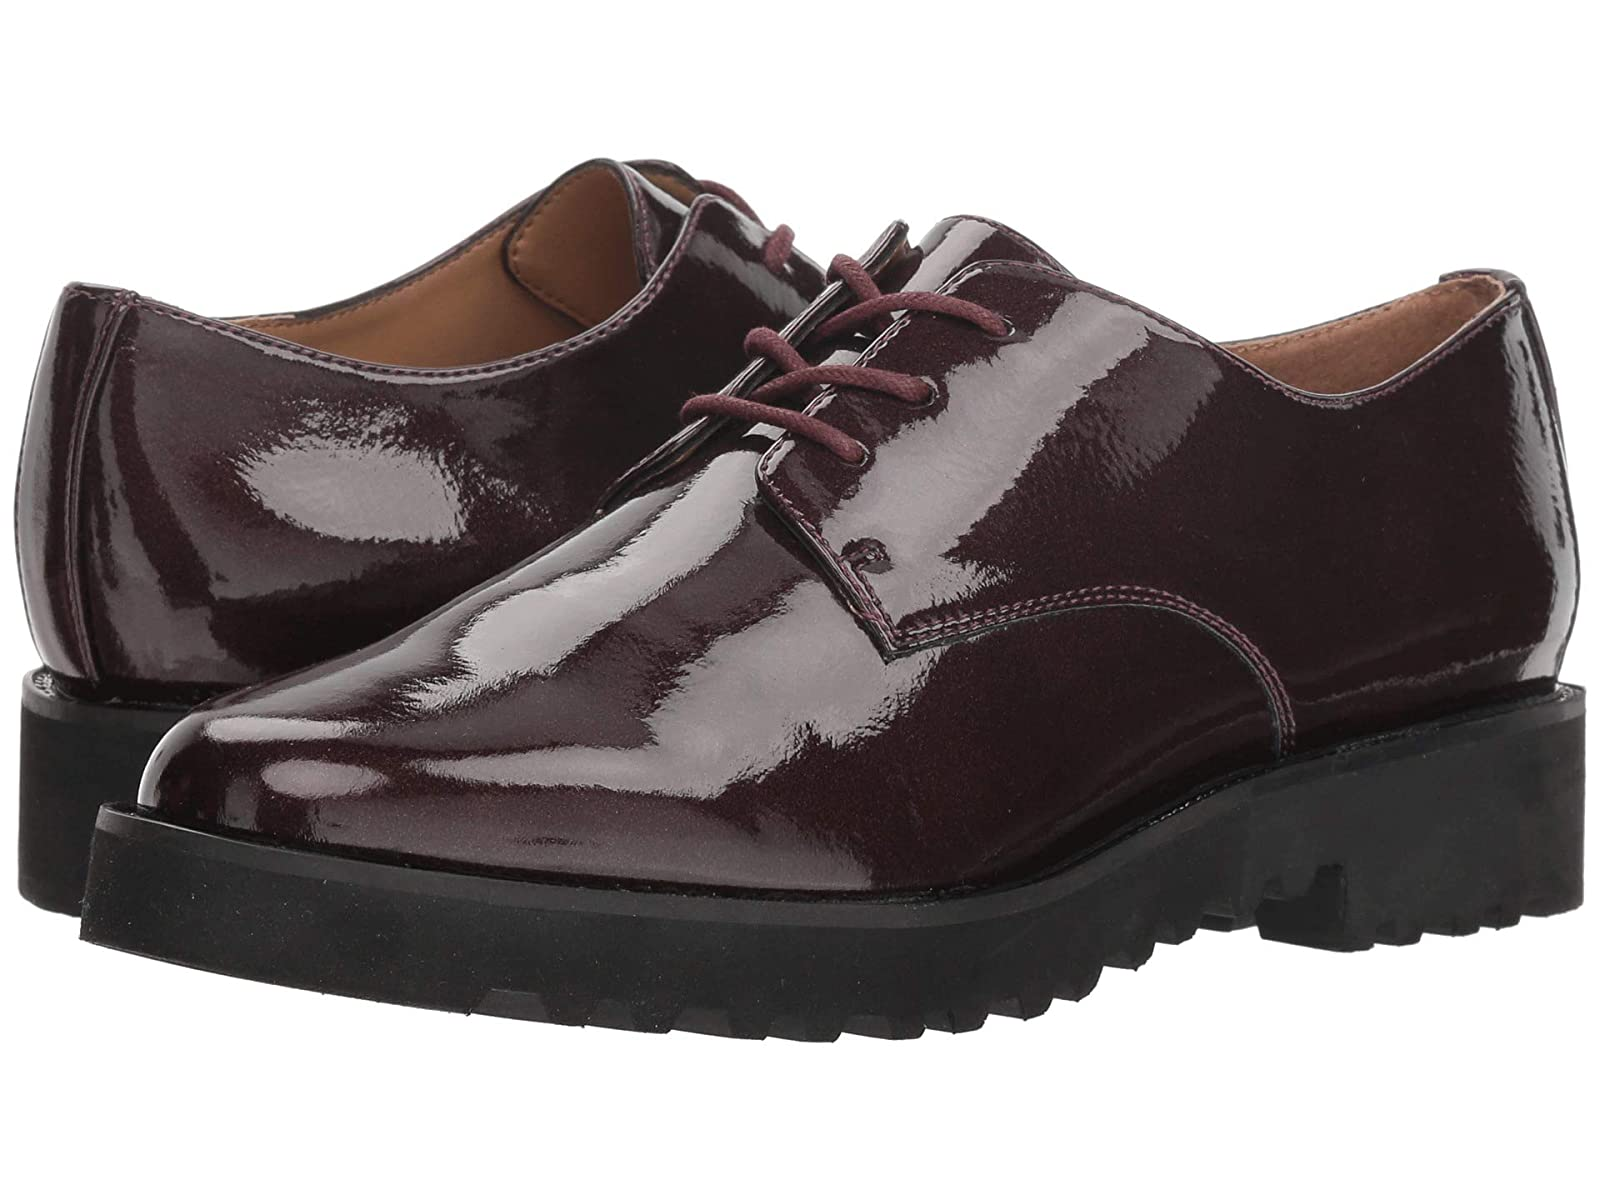 Franco Sarto L-ConroeAtmospheric grades have affordable shoes